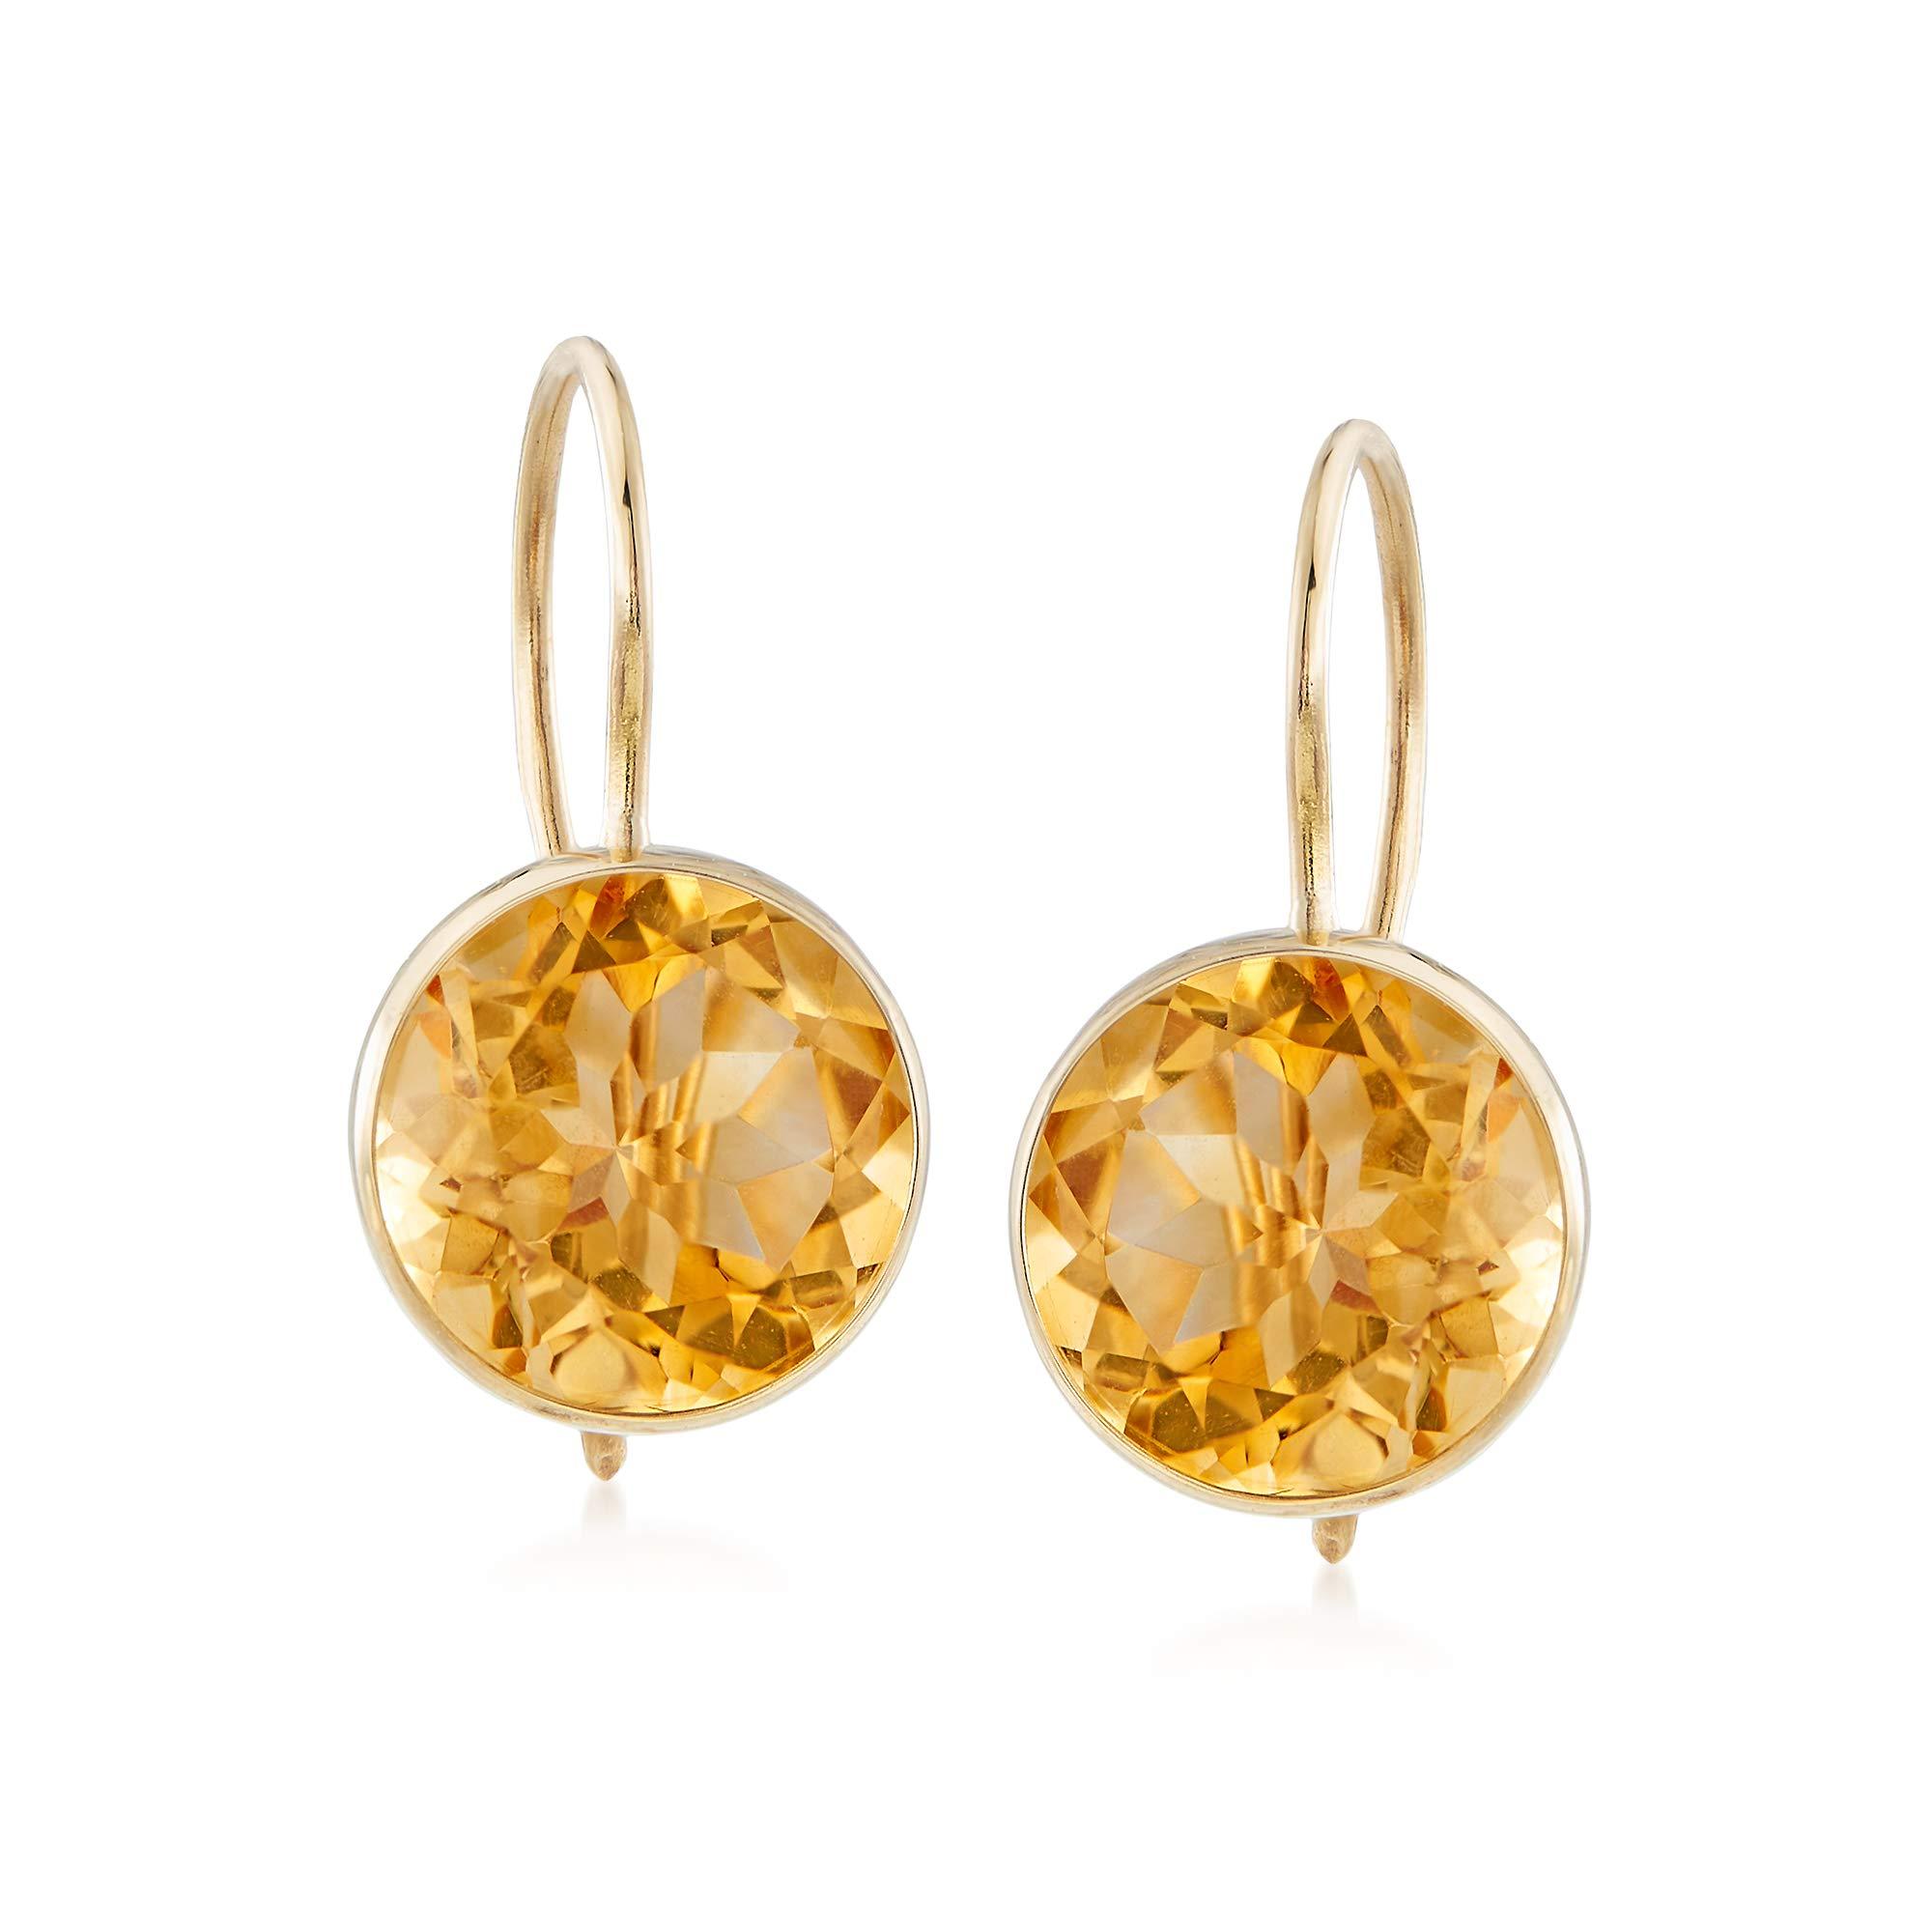 Ross-Simons 3.20 ct. t.w. Citrine Drop Earrings in 14kt Yellow Gold